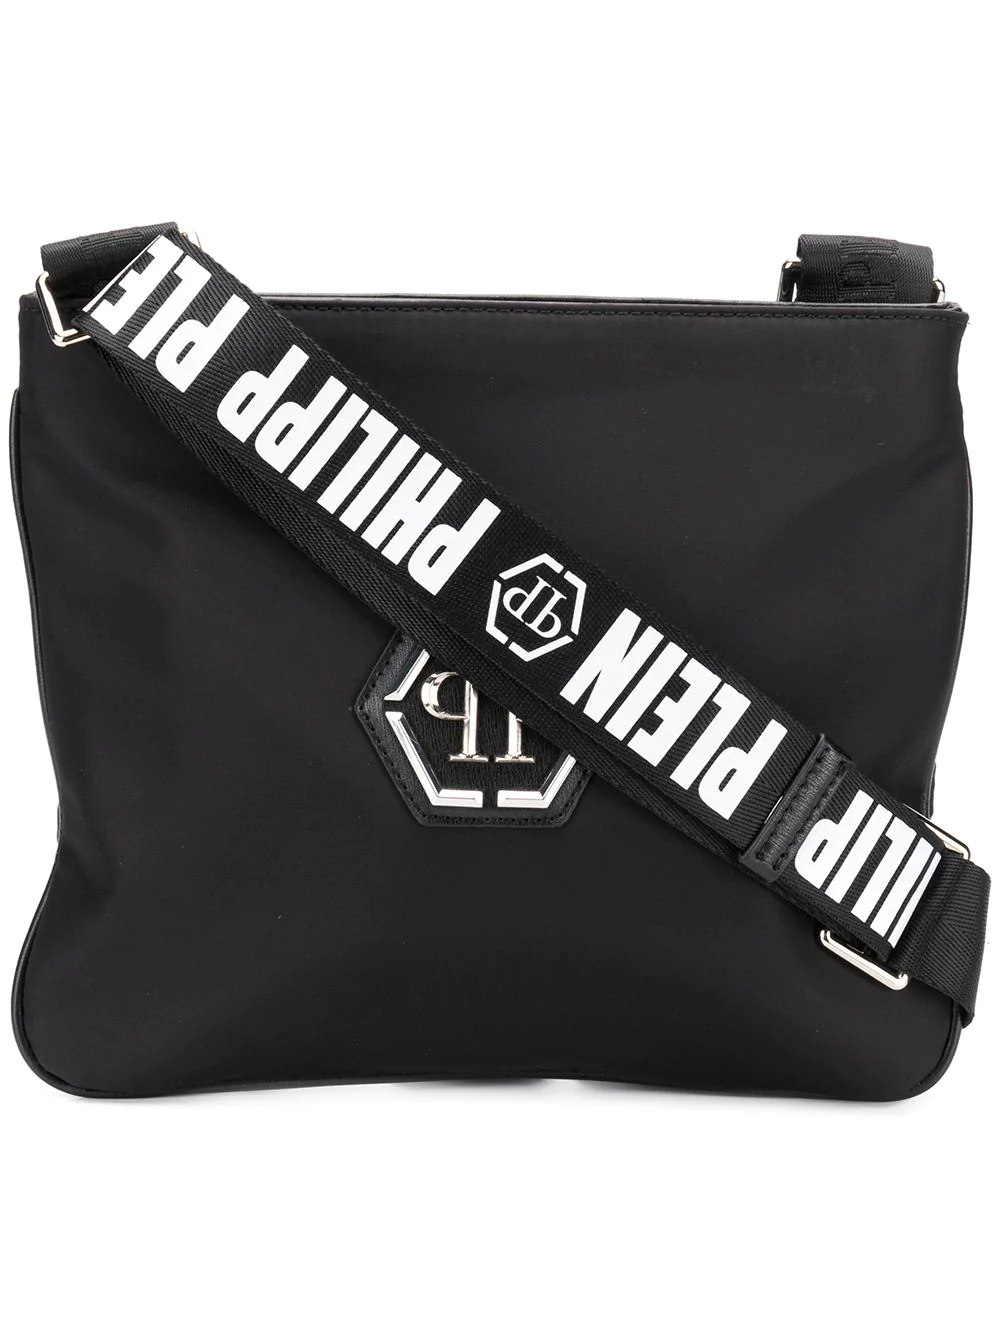 8ebf924f42 Philipp Plein Logo Strap Shoulder Bag - Black | ModeSens